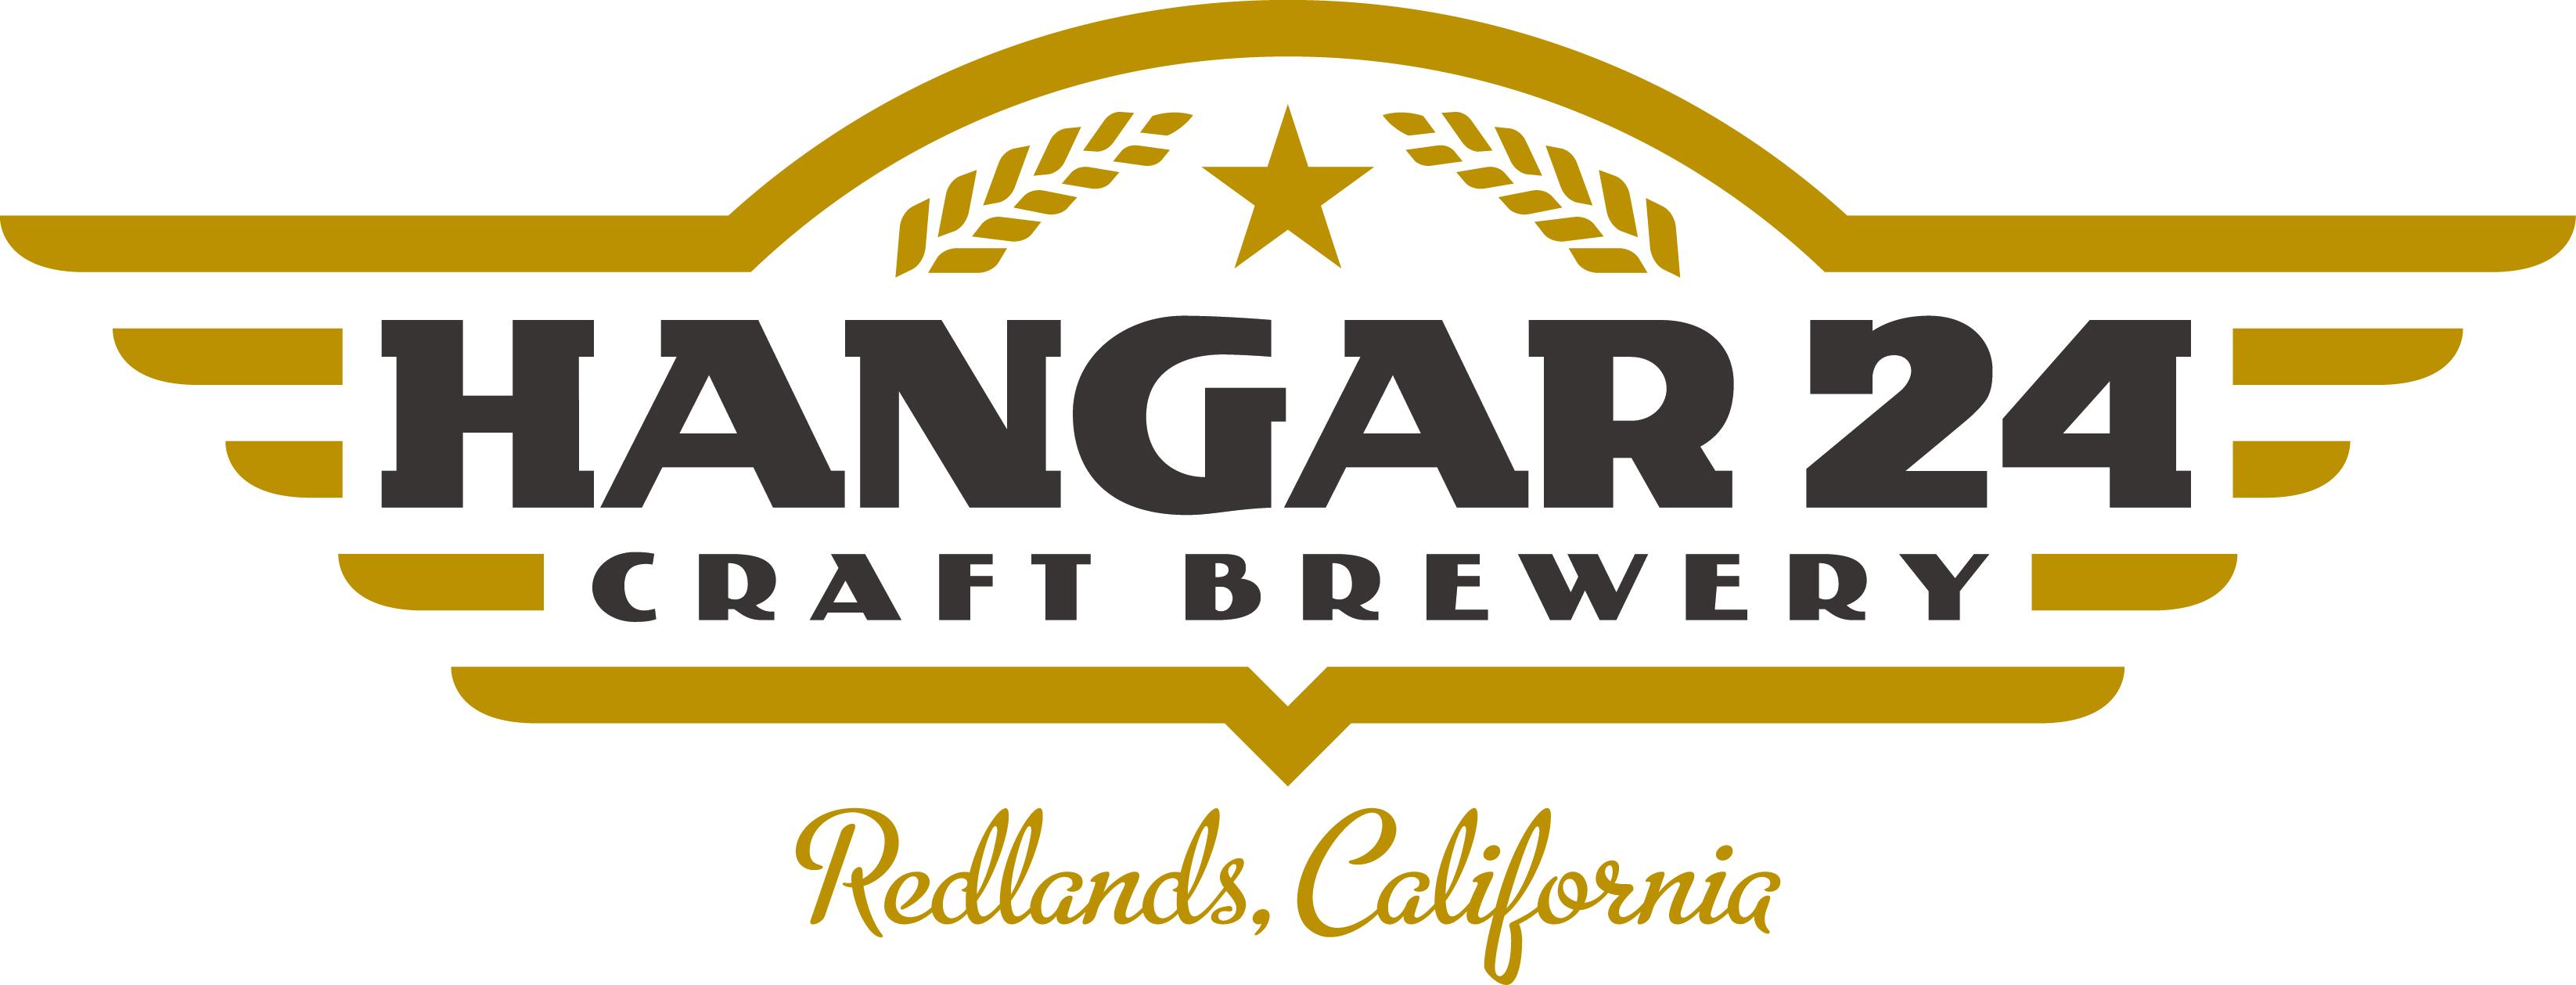 Hangar 24 Craft Brewery to organize multiple fundraising ...